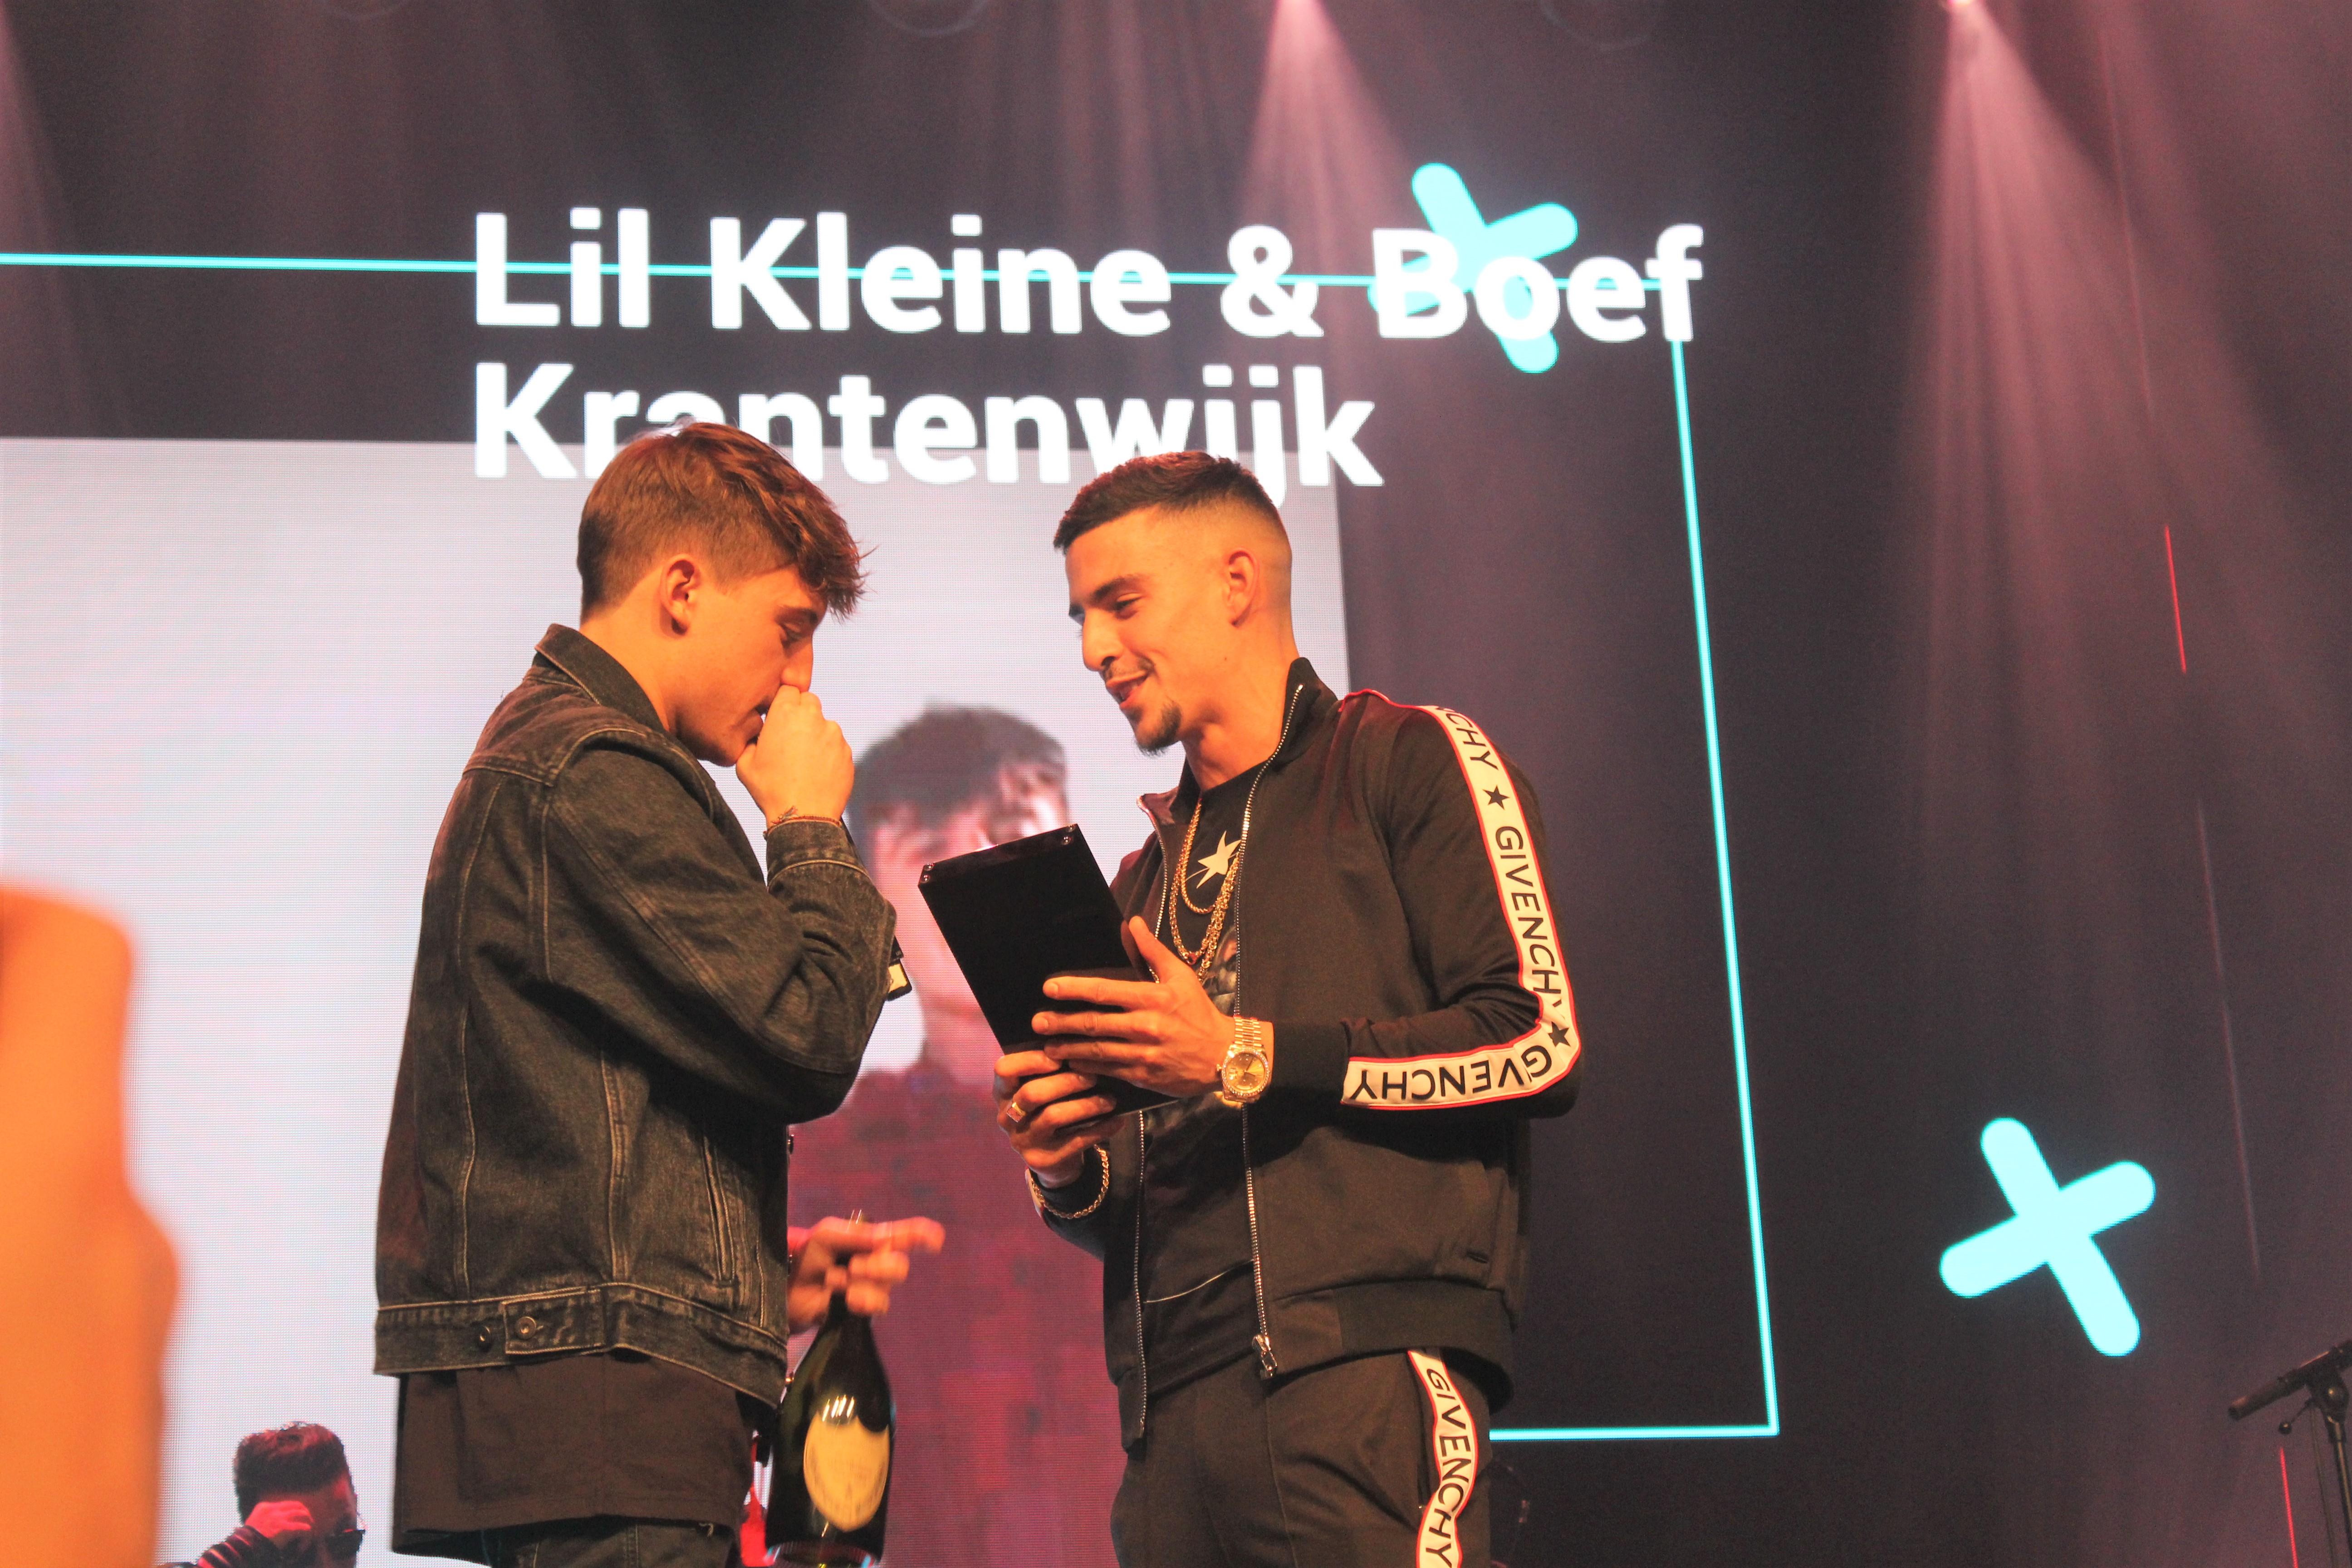 Lil Kleine en Boef @ XITE Awards - Fotocredits: Chenneti Ascencion (Artiestennieuws)